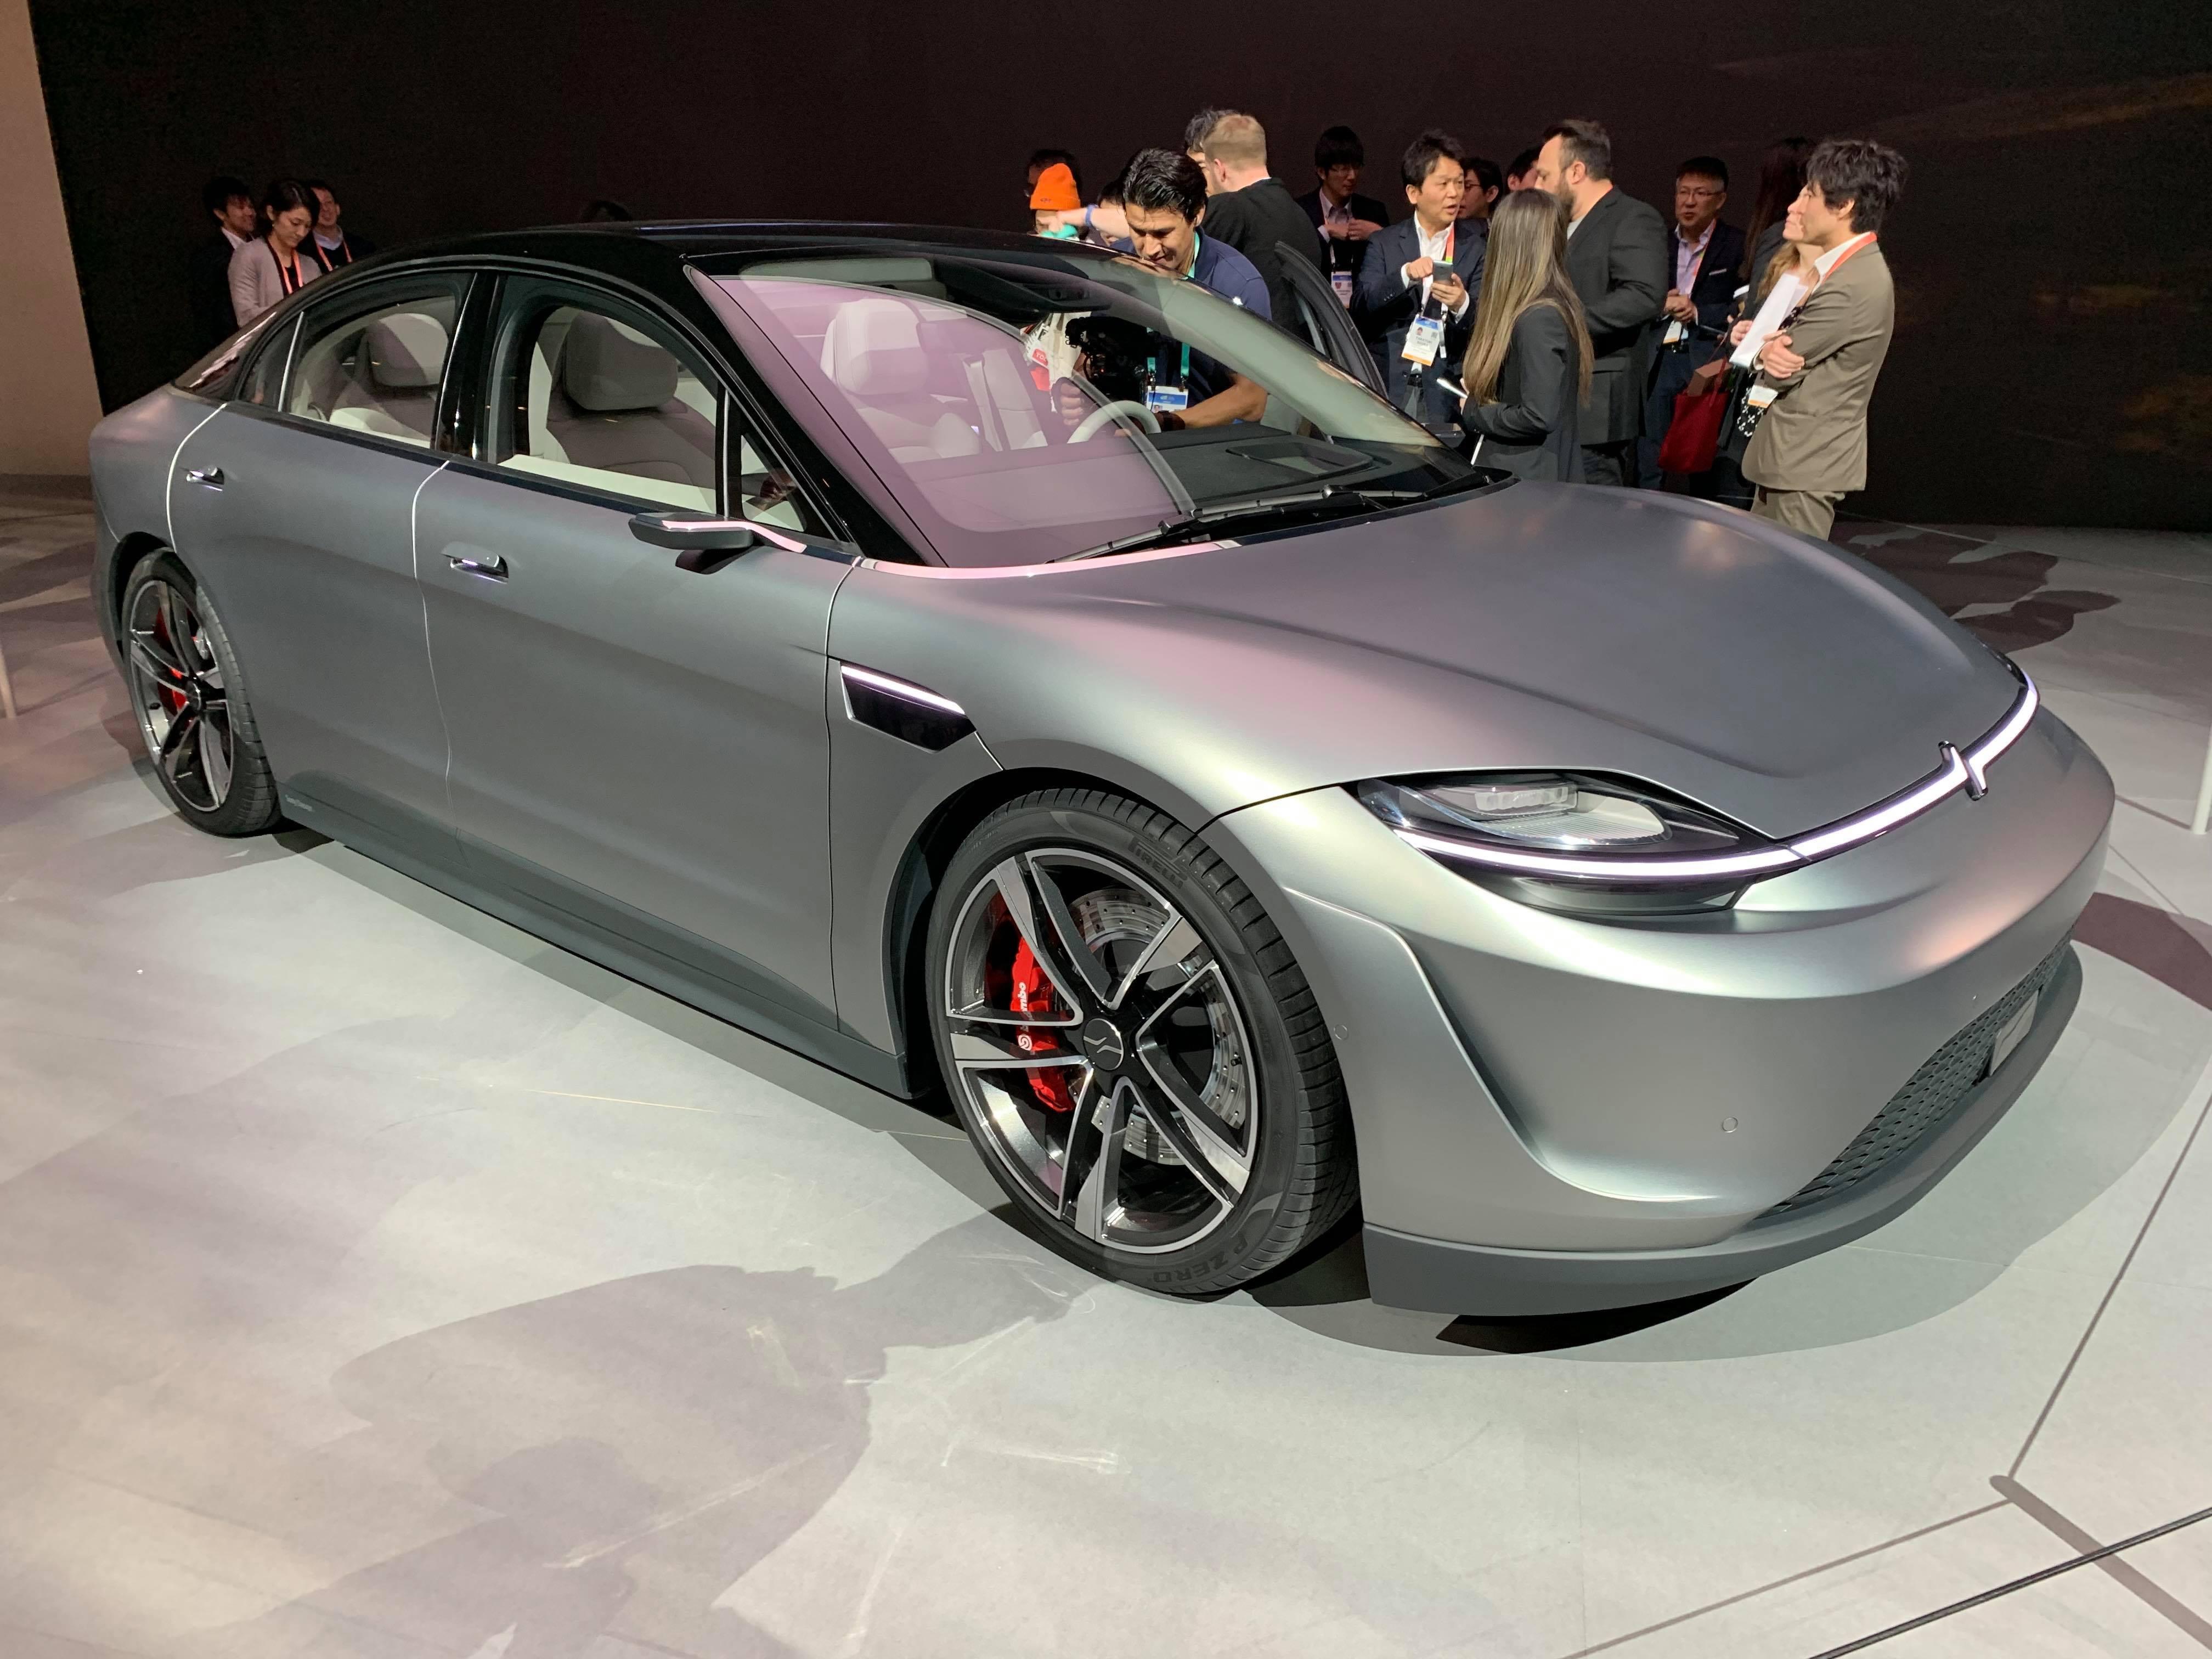 SONYが発表したEV車「VISION-S」